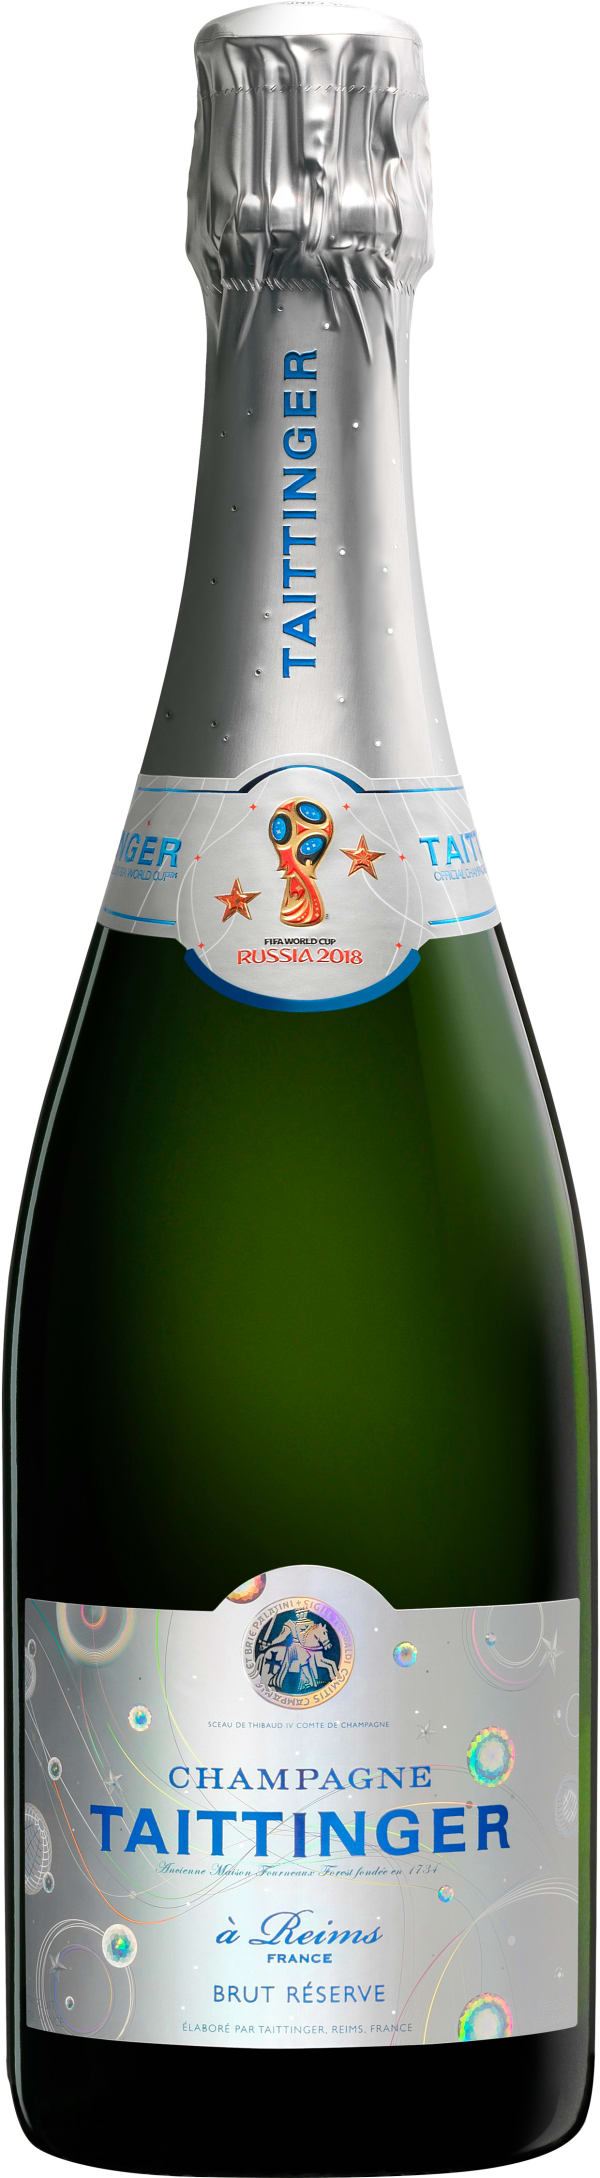 Taittinger Réserve Official FIFA World Cup Champagne Brut